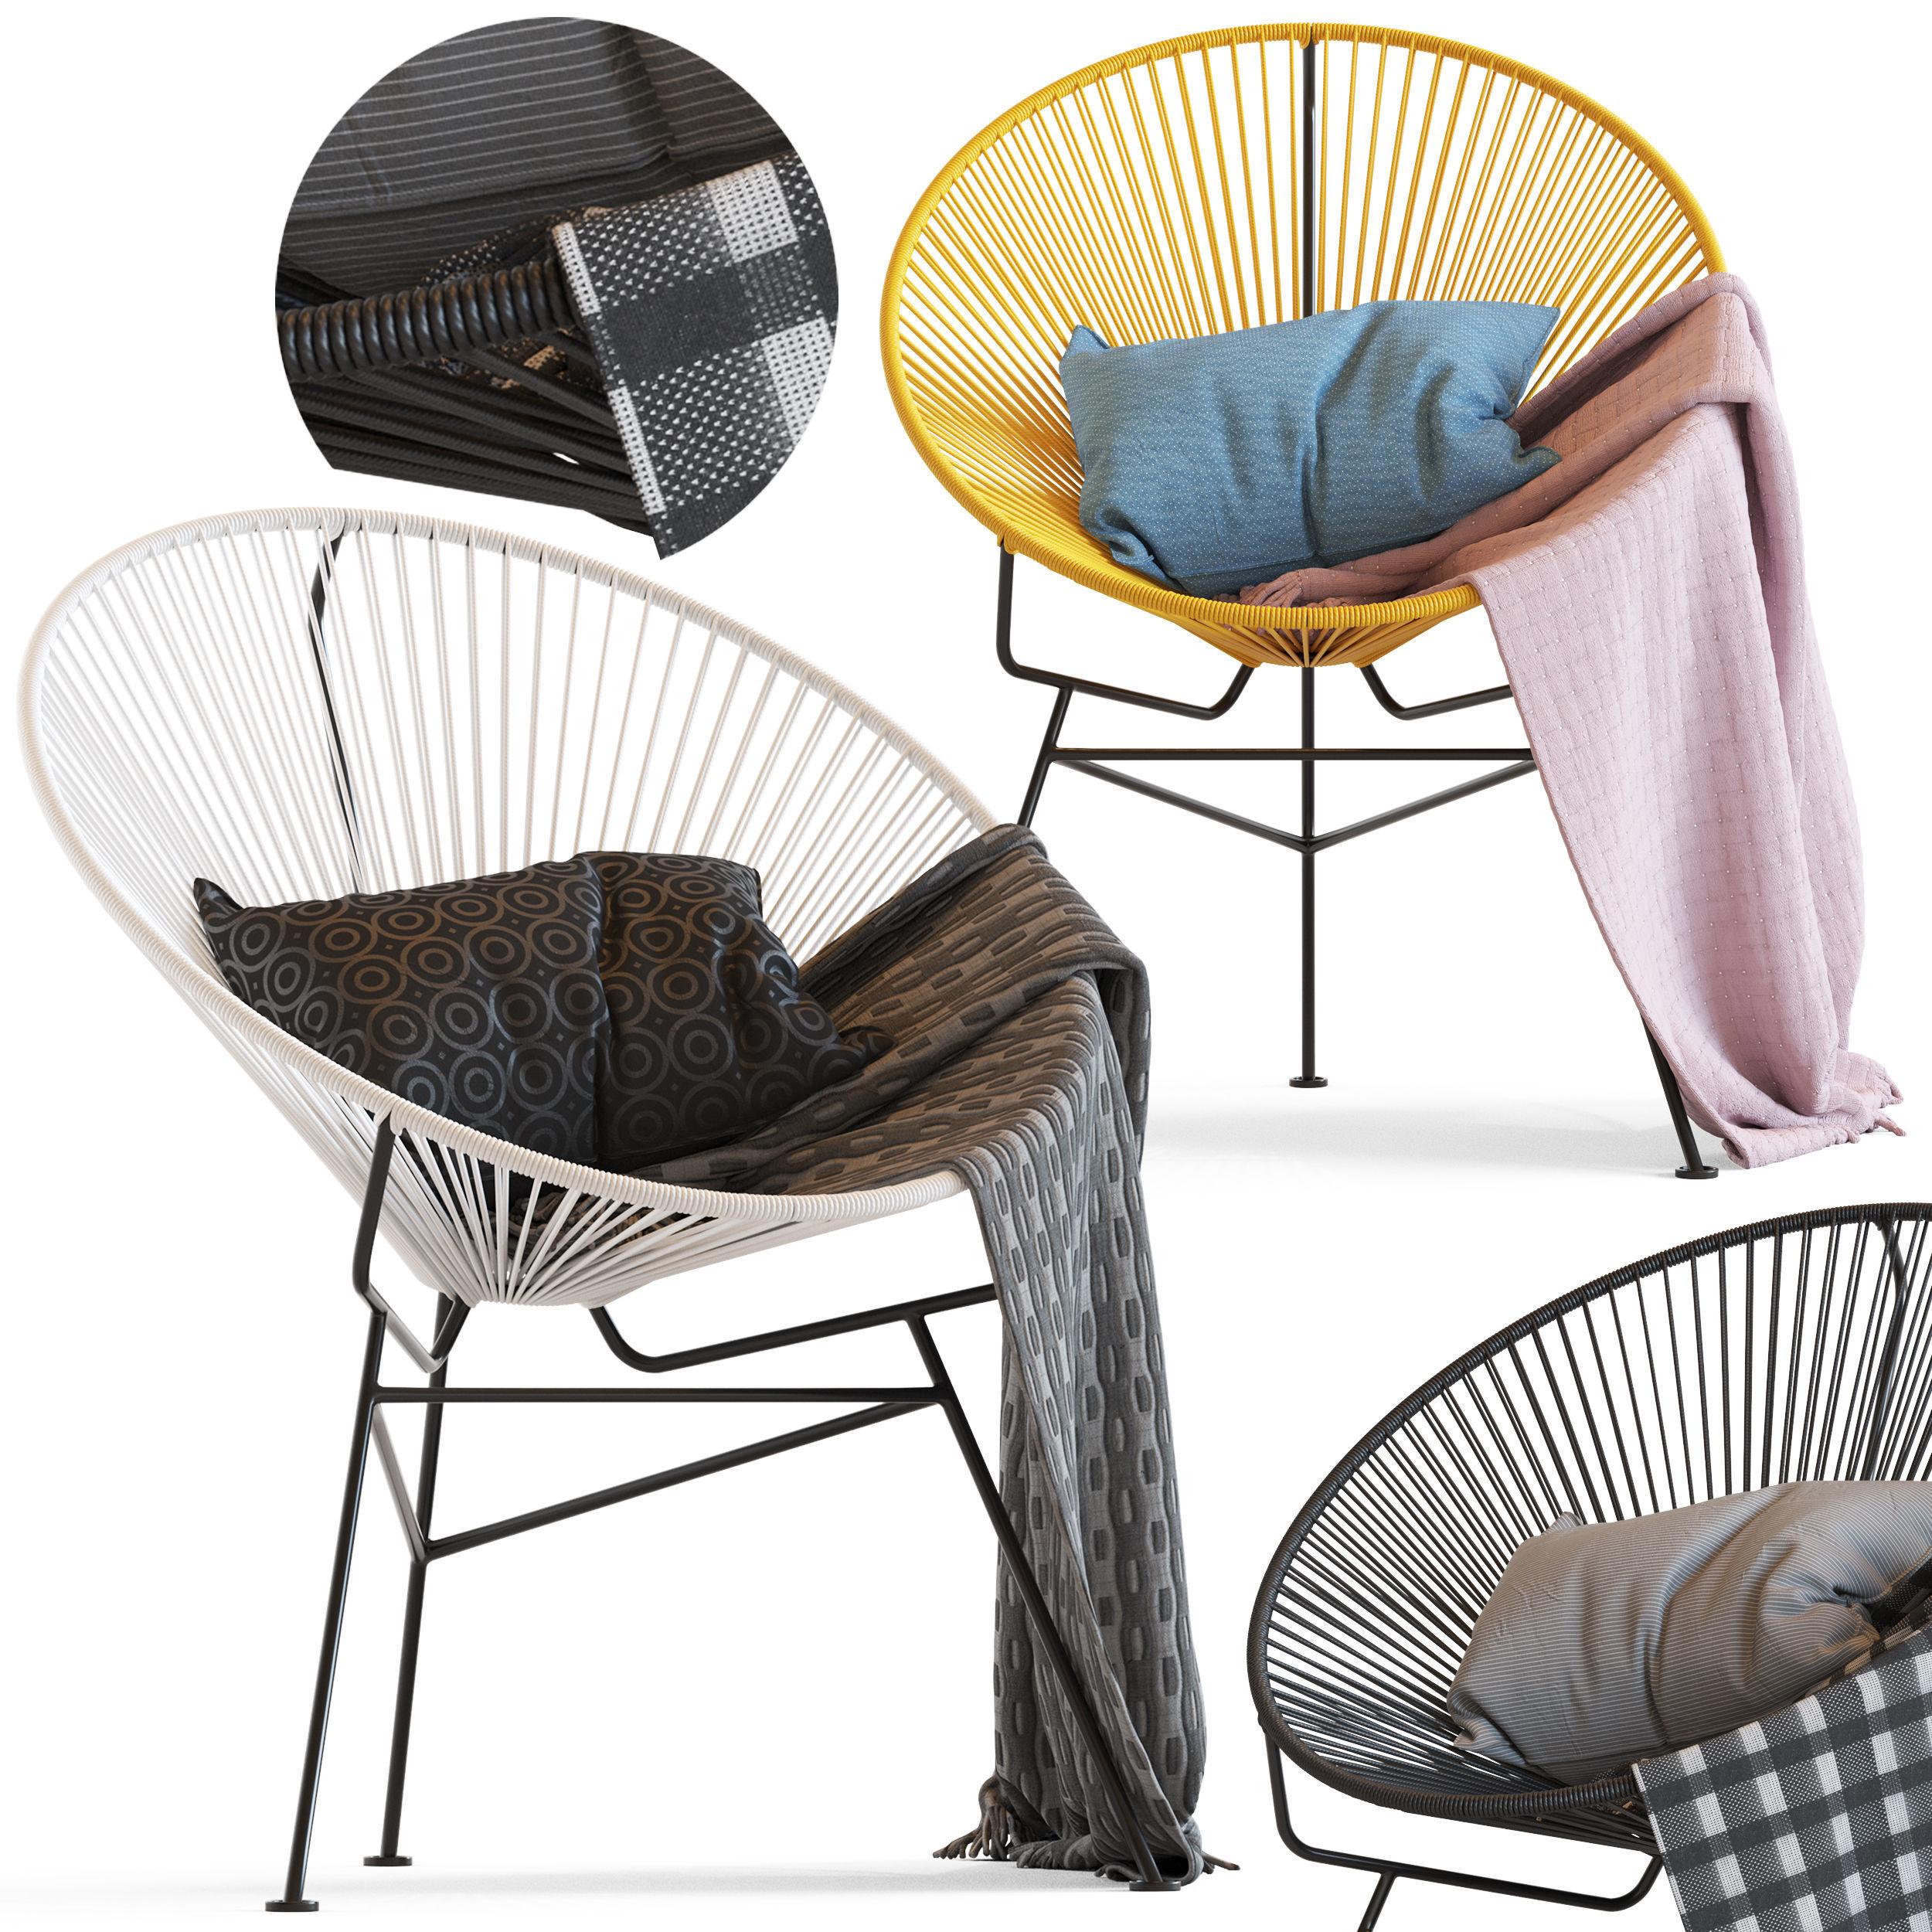 Cult Furniture Armando Chair and Acapulco chair